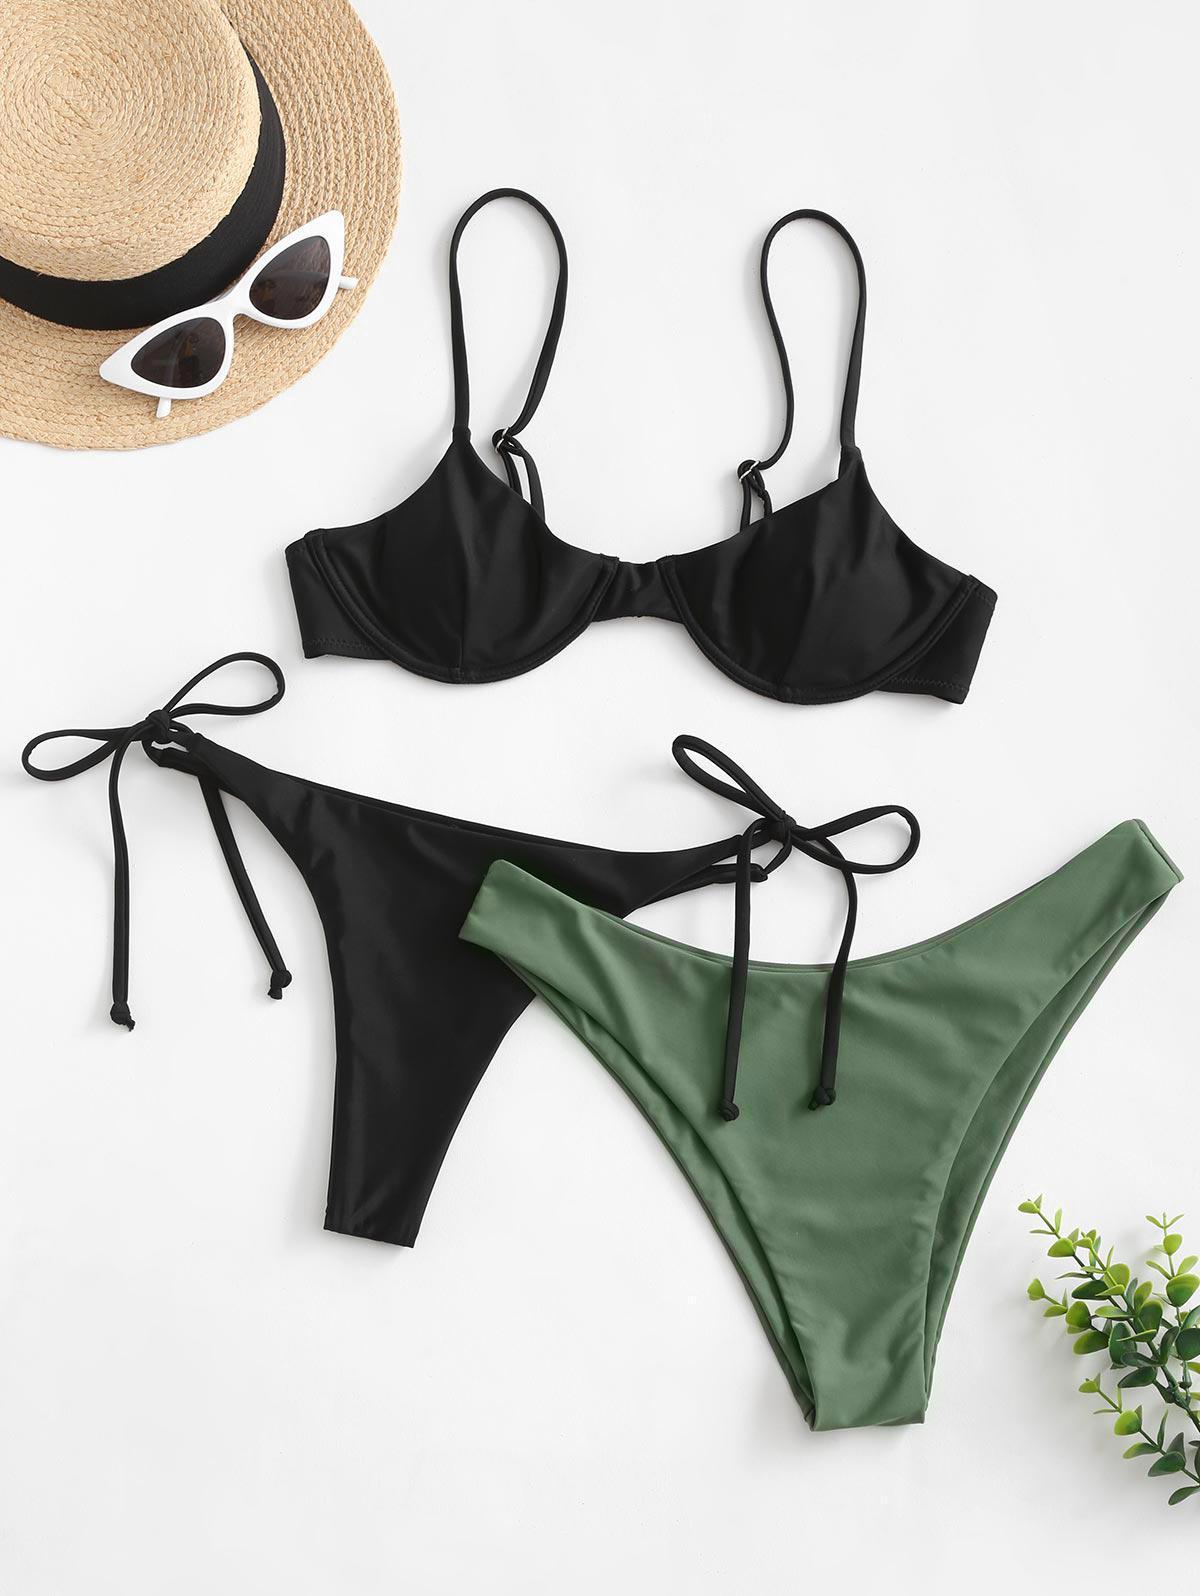 ZAFUL Tie Side Underwire Three Piece Swimsuit фото